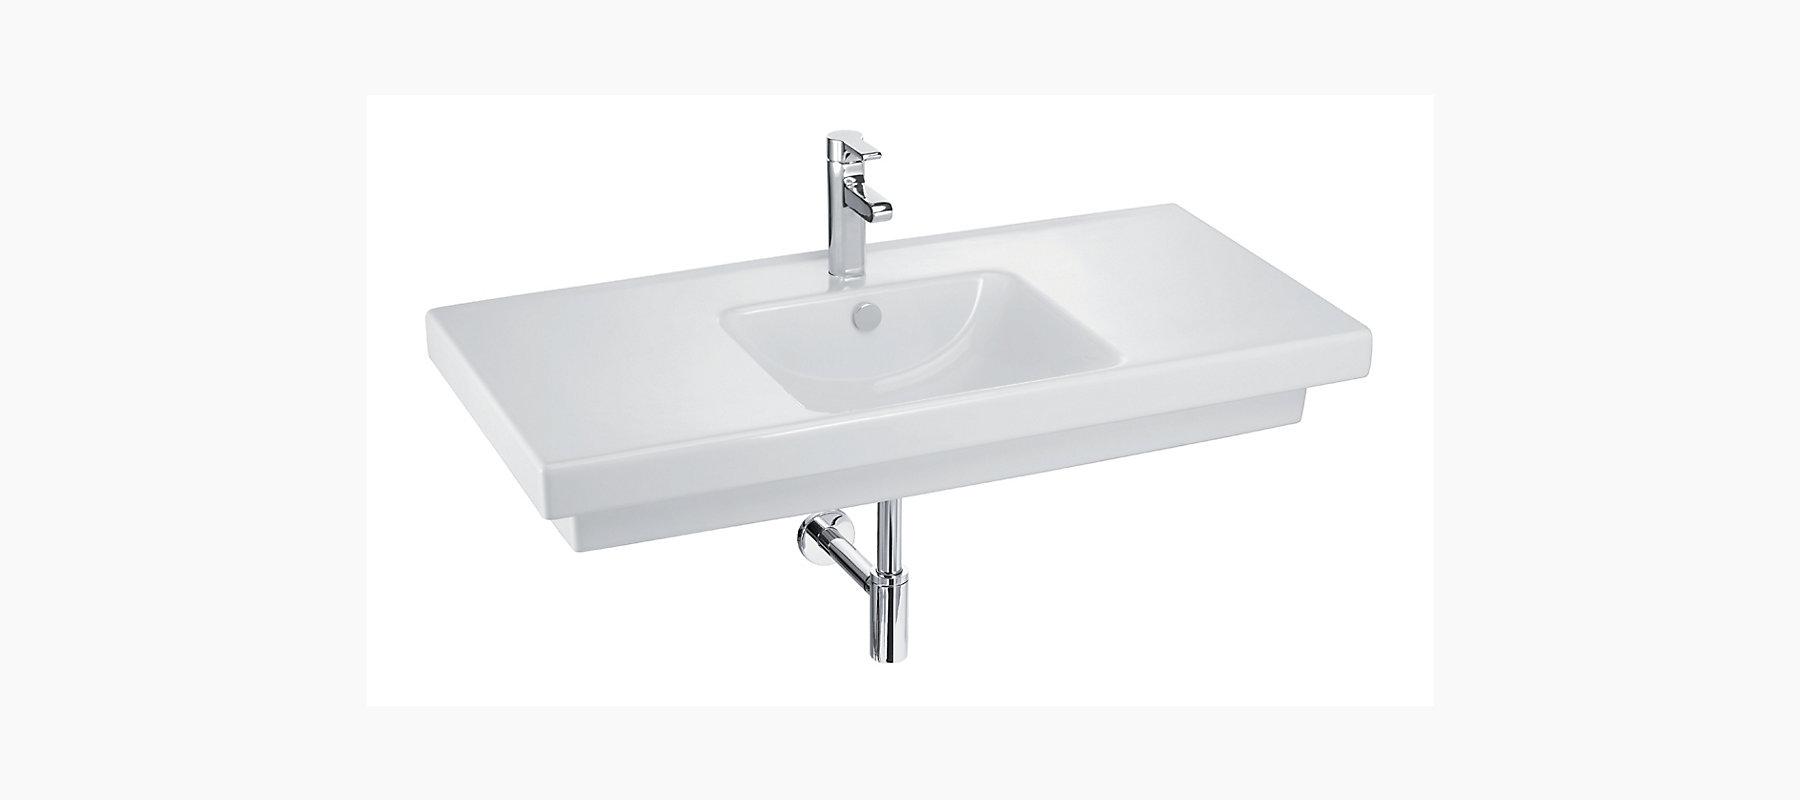 Reach Vanity Top With Single Faucet Hole K 18571t 1 Kohler